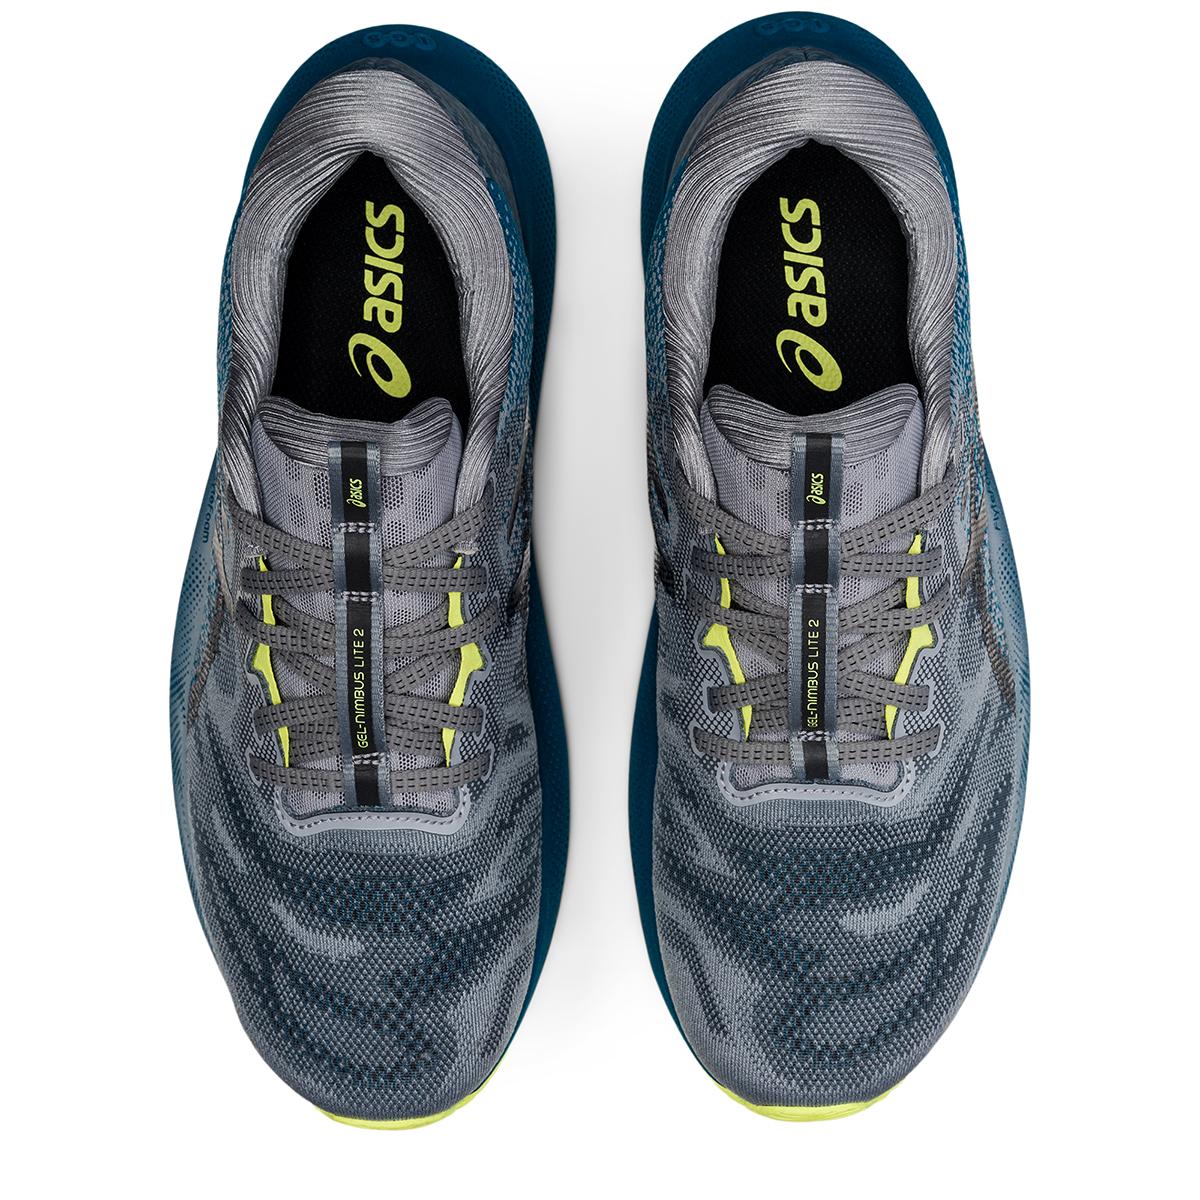 Men's Asics Gel-Nimbus Lite 2 Running Shoe - Color: Deep Sea Teal - Size: 7 - Width: Regular, Deep Sea Teal, large, image 5